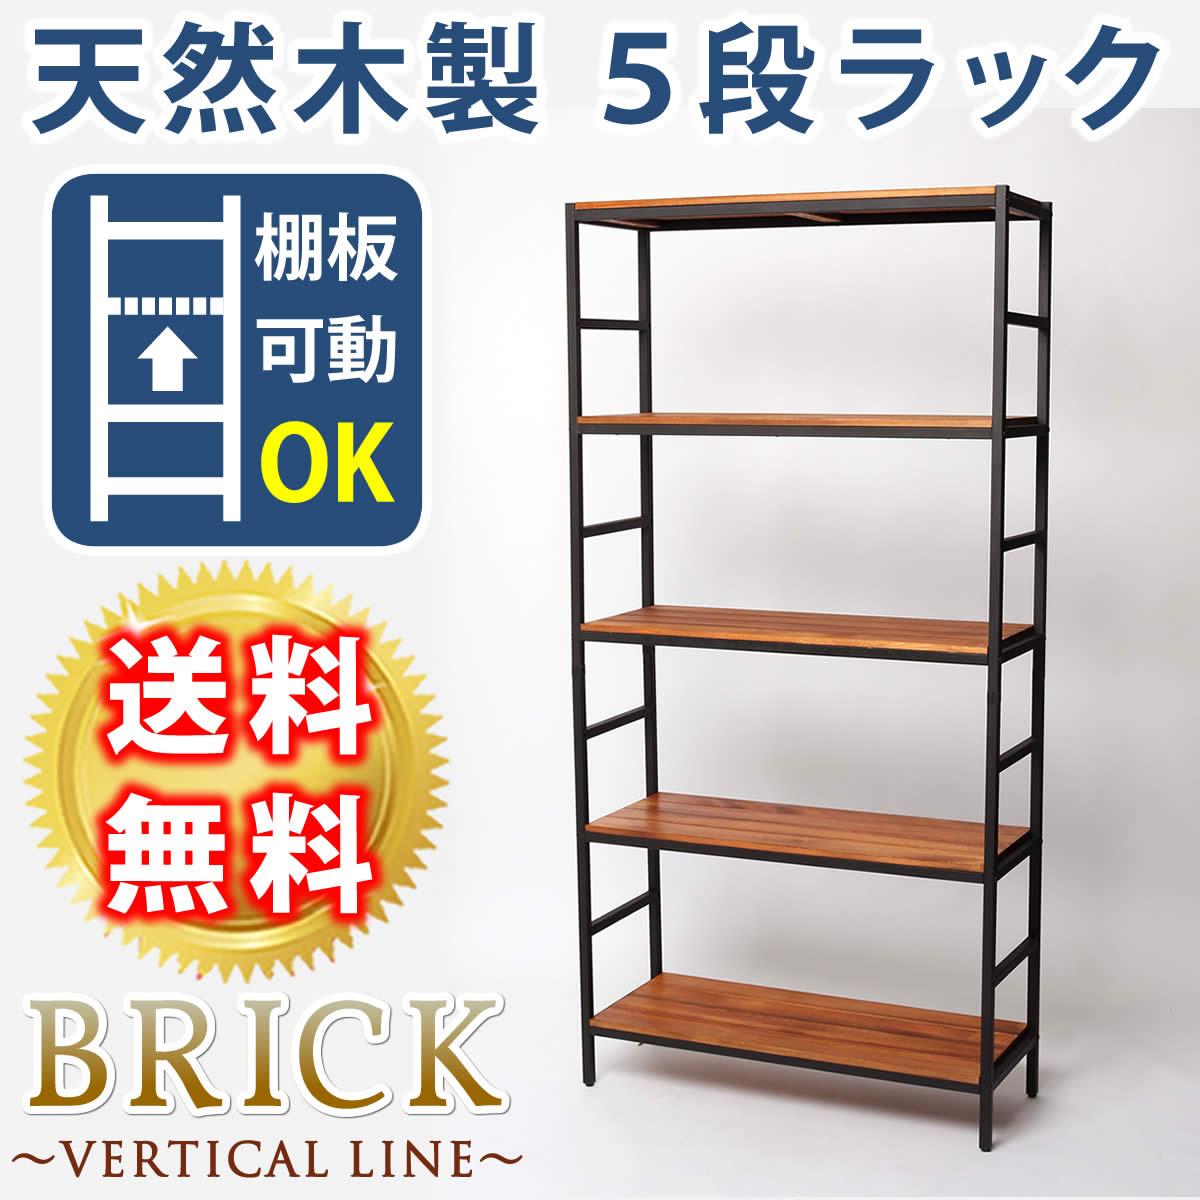 BRICK(ブリック) 5段タイプ 86×32×175 送料無料 簡単組立 5段 西海岸 PRU-8632175